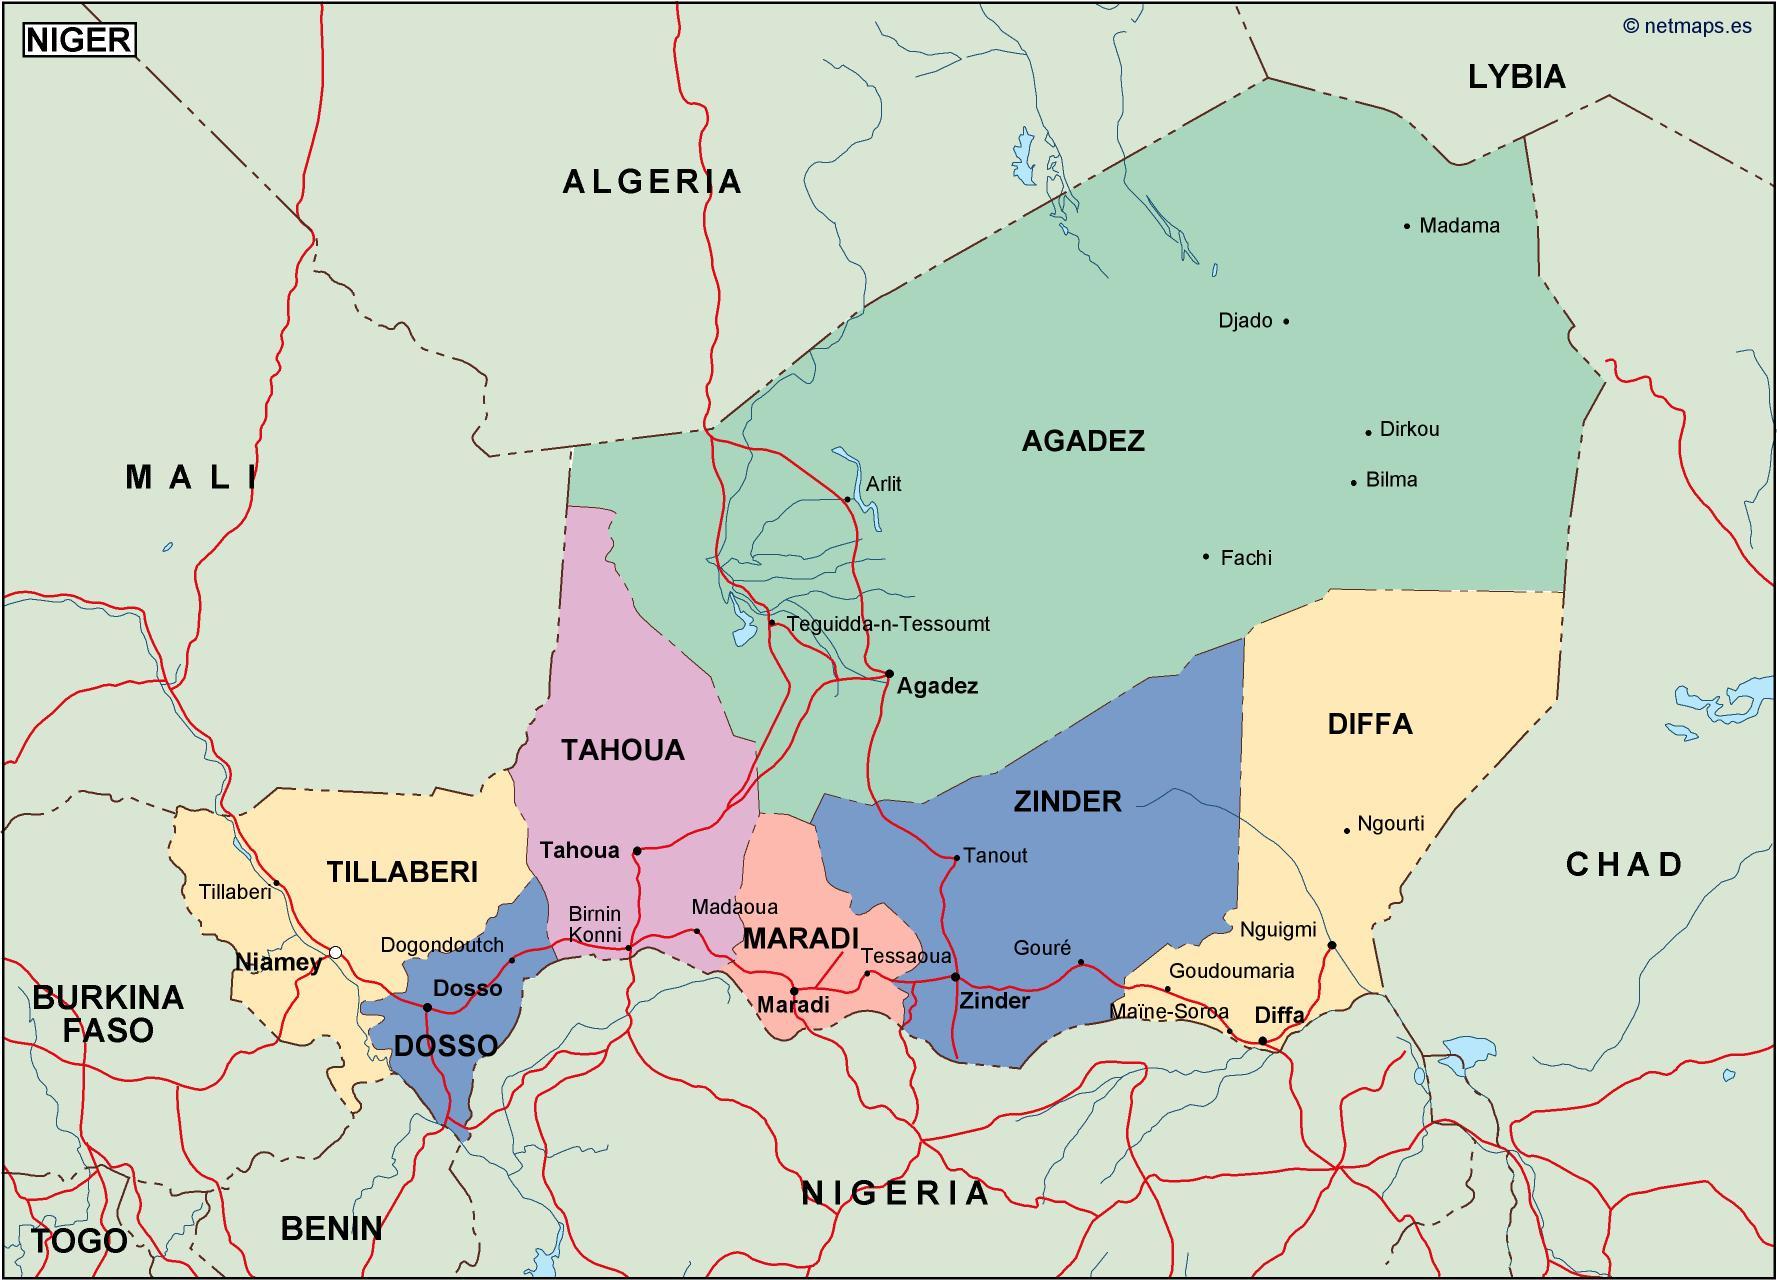 niger political map. Vector Eps maps. Eps Illustrator Map